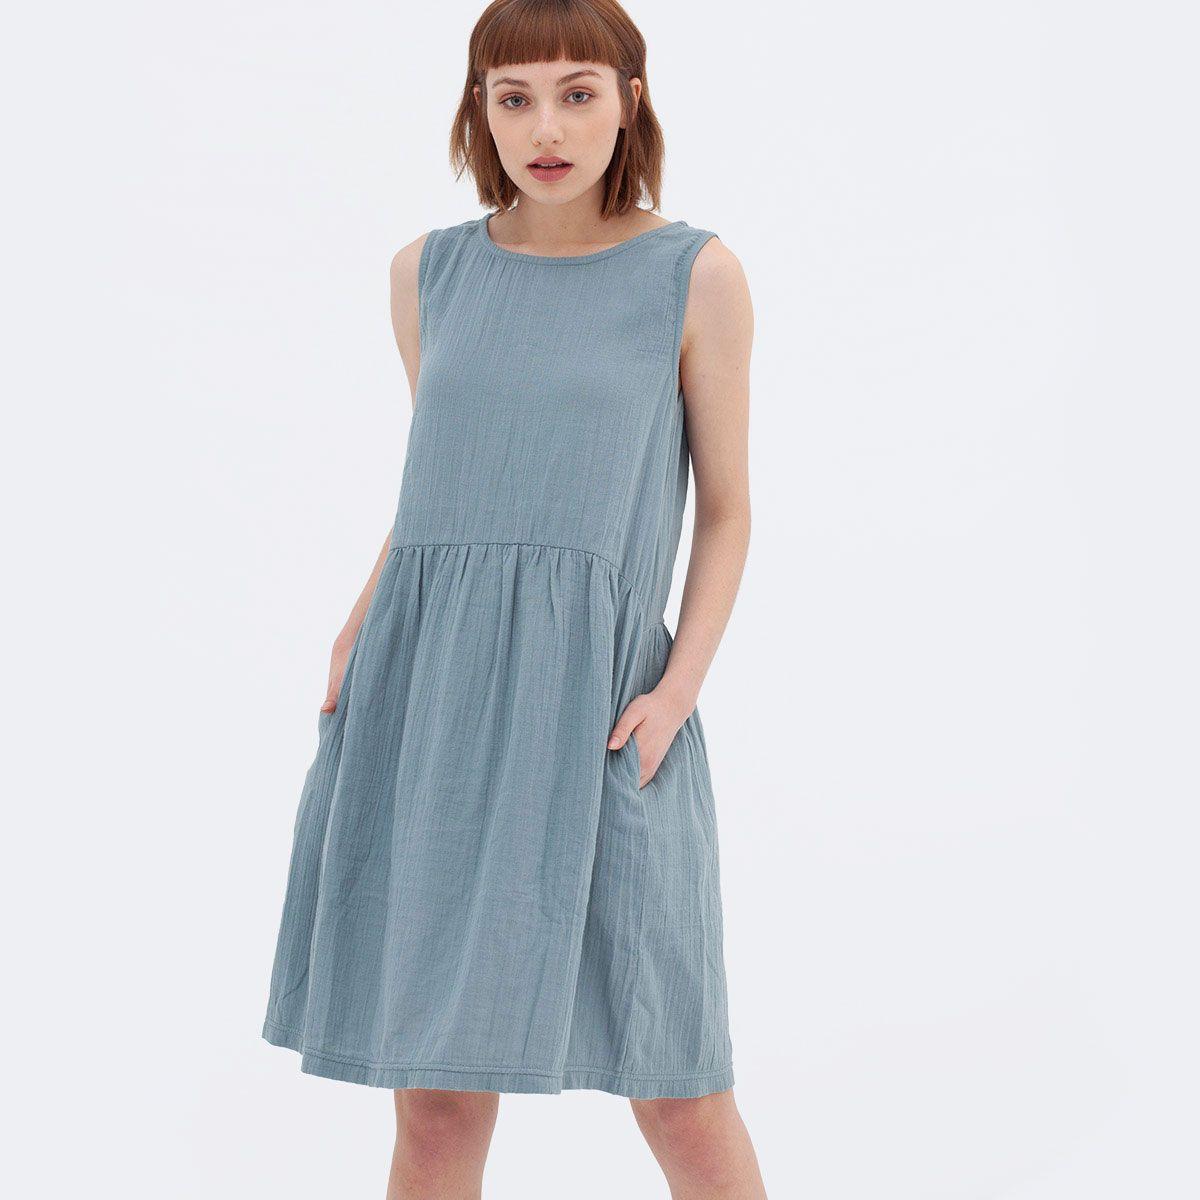 Vestido ecológico azul de algodón orgánico